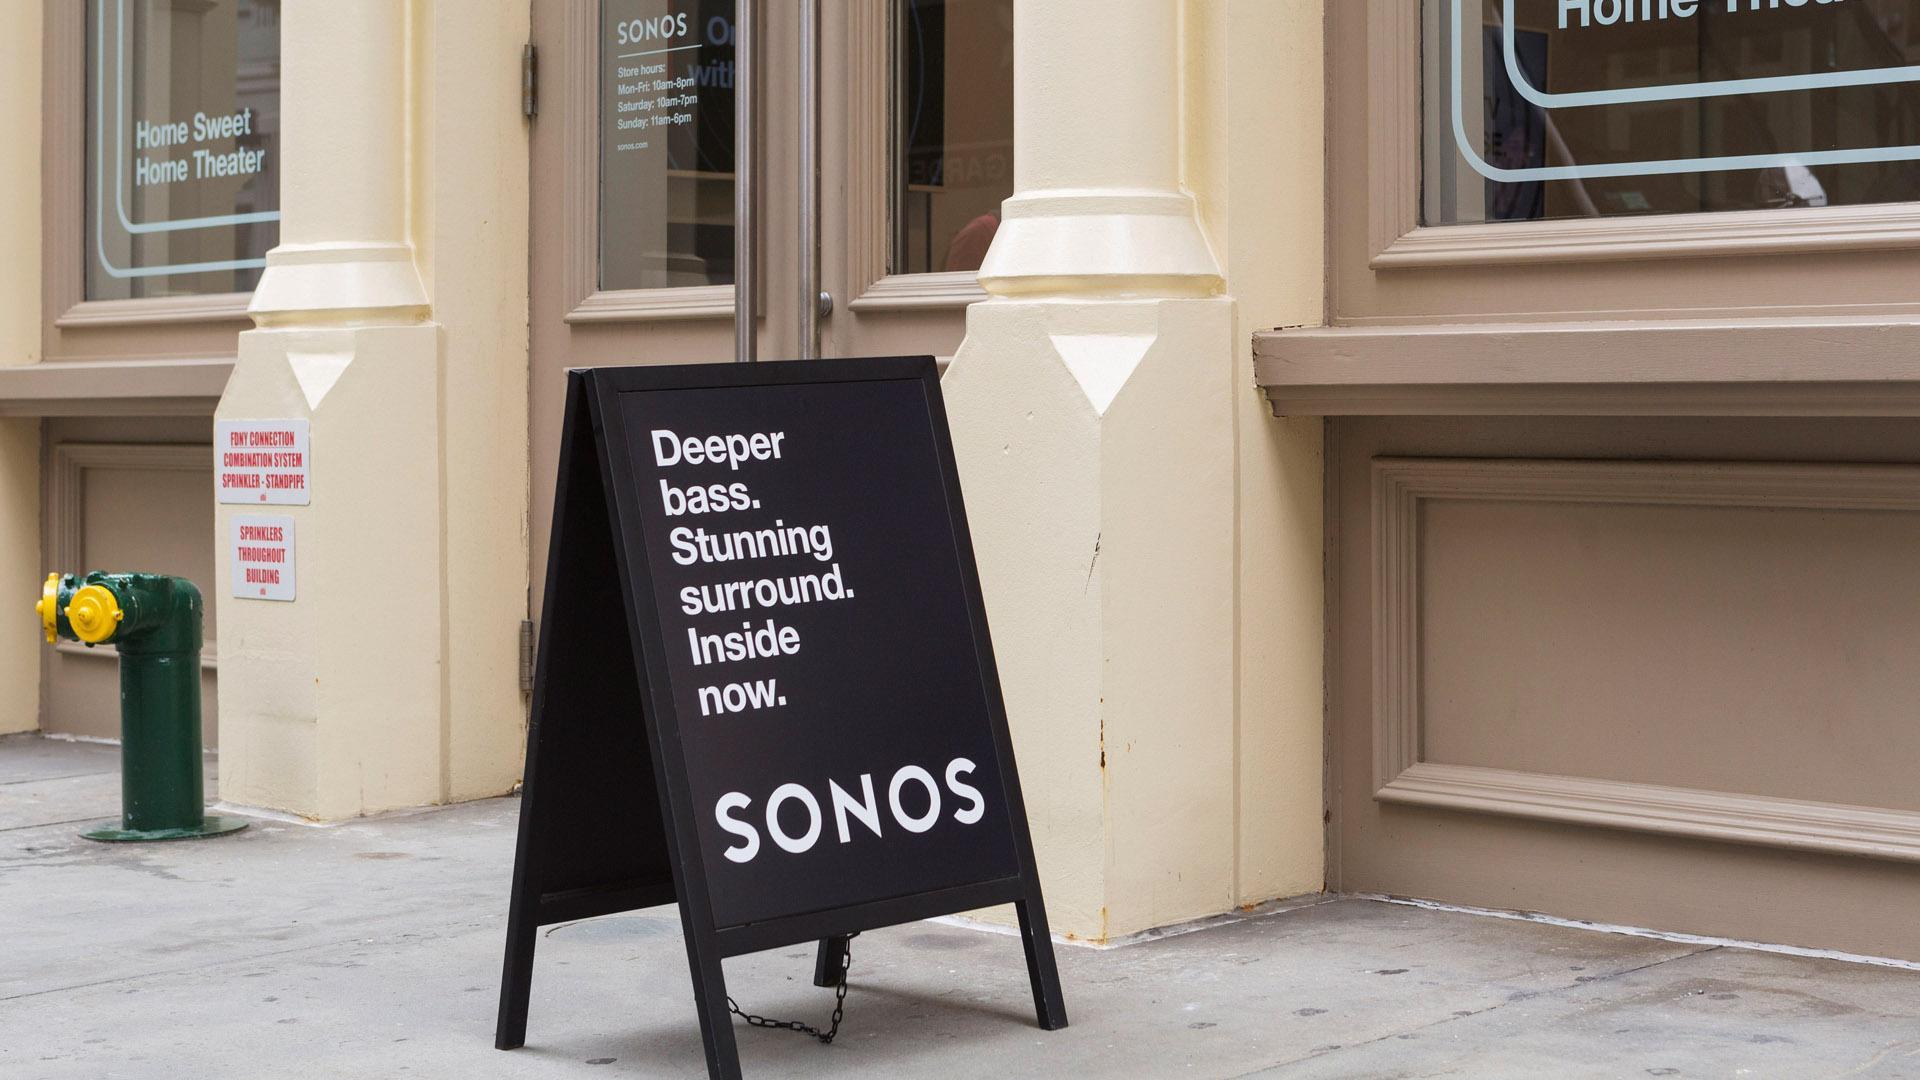 Sonos signage